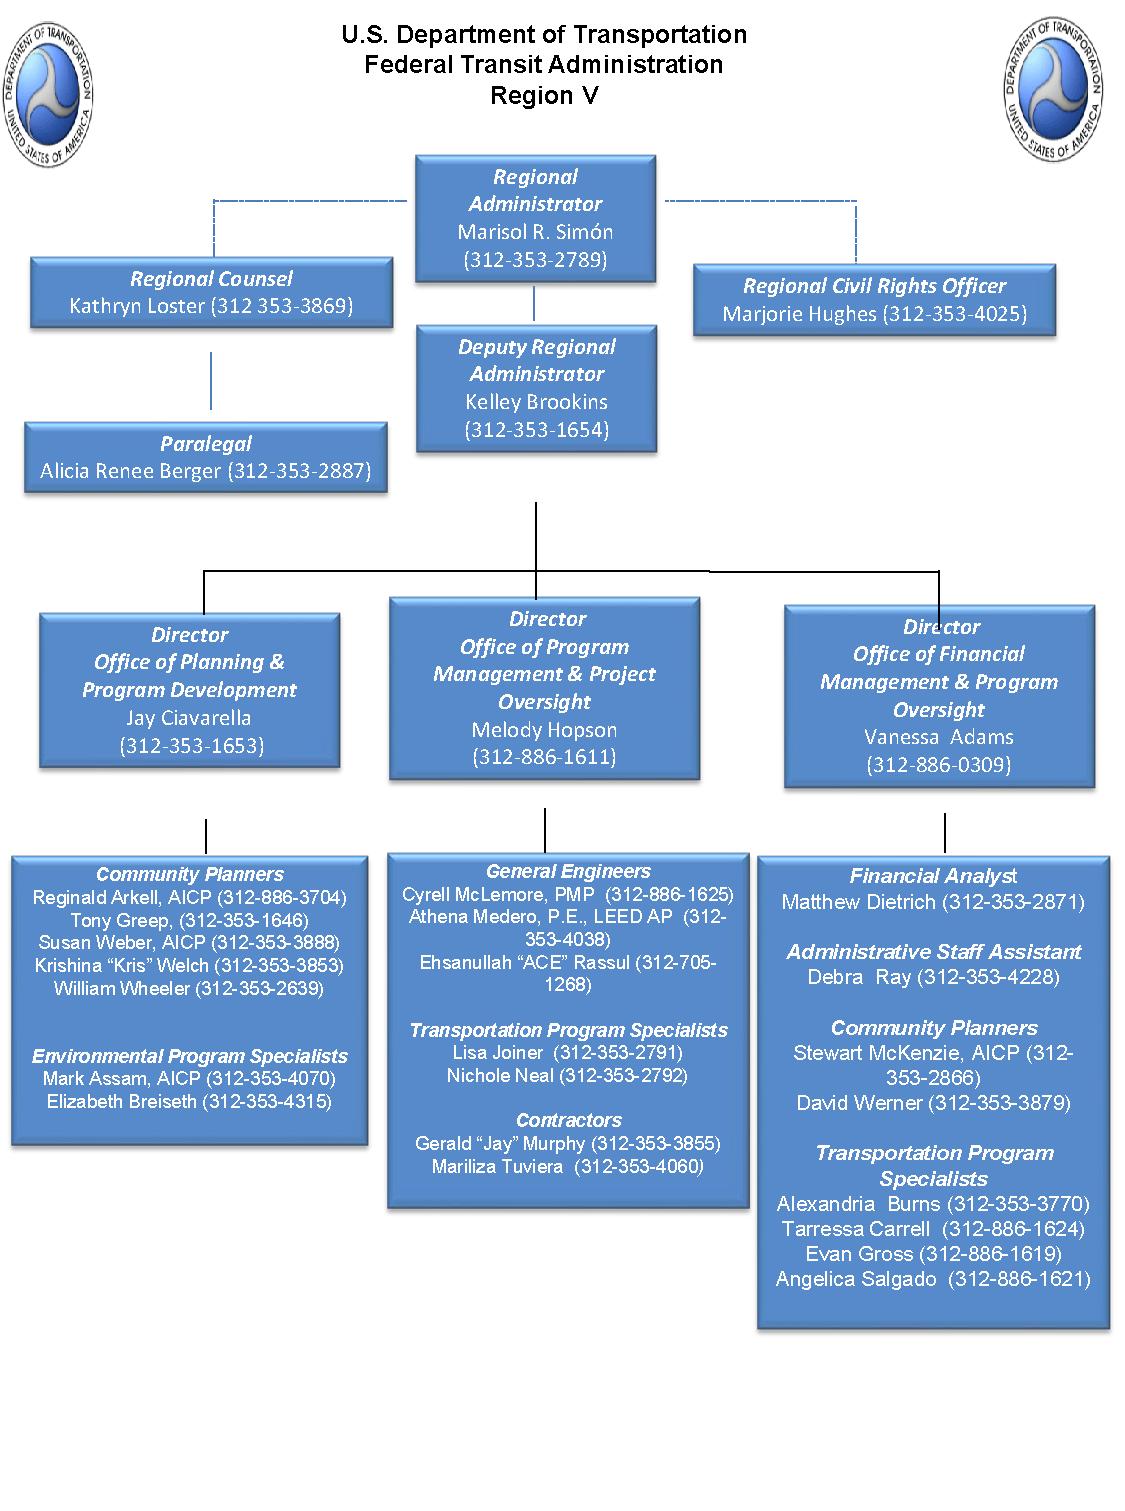 Region 5 Organizational Chart